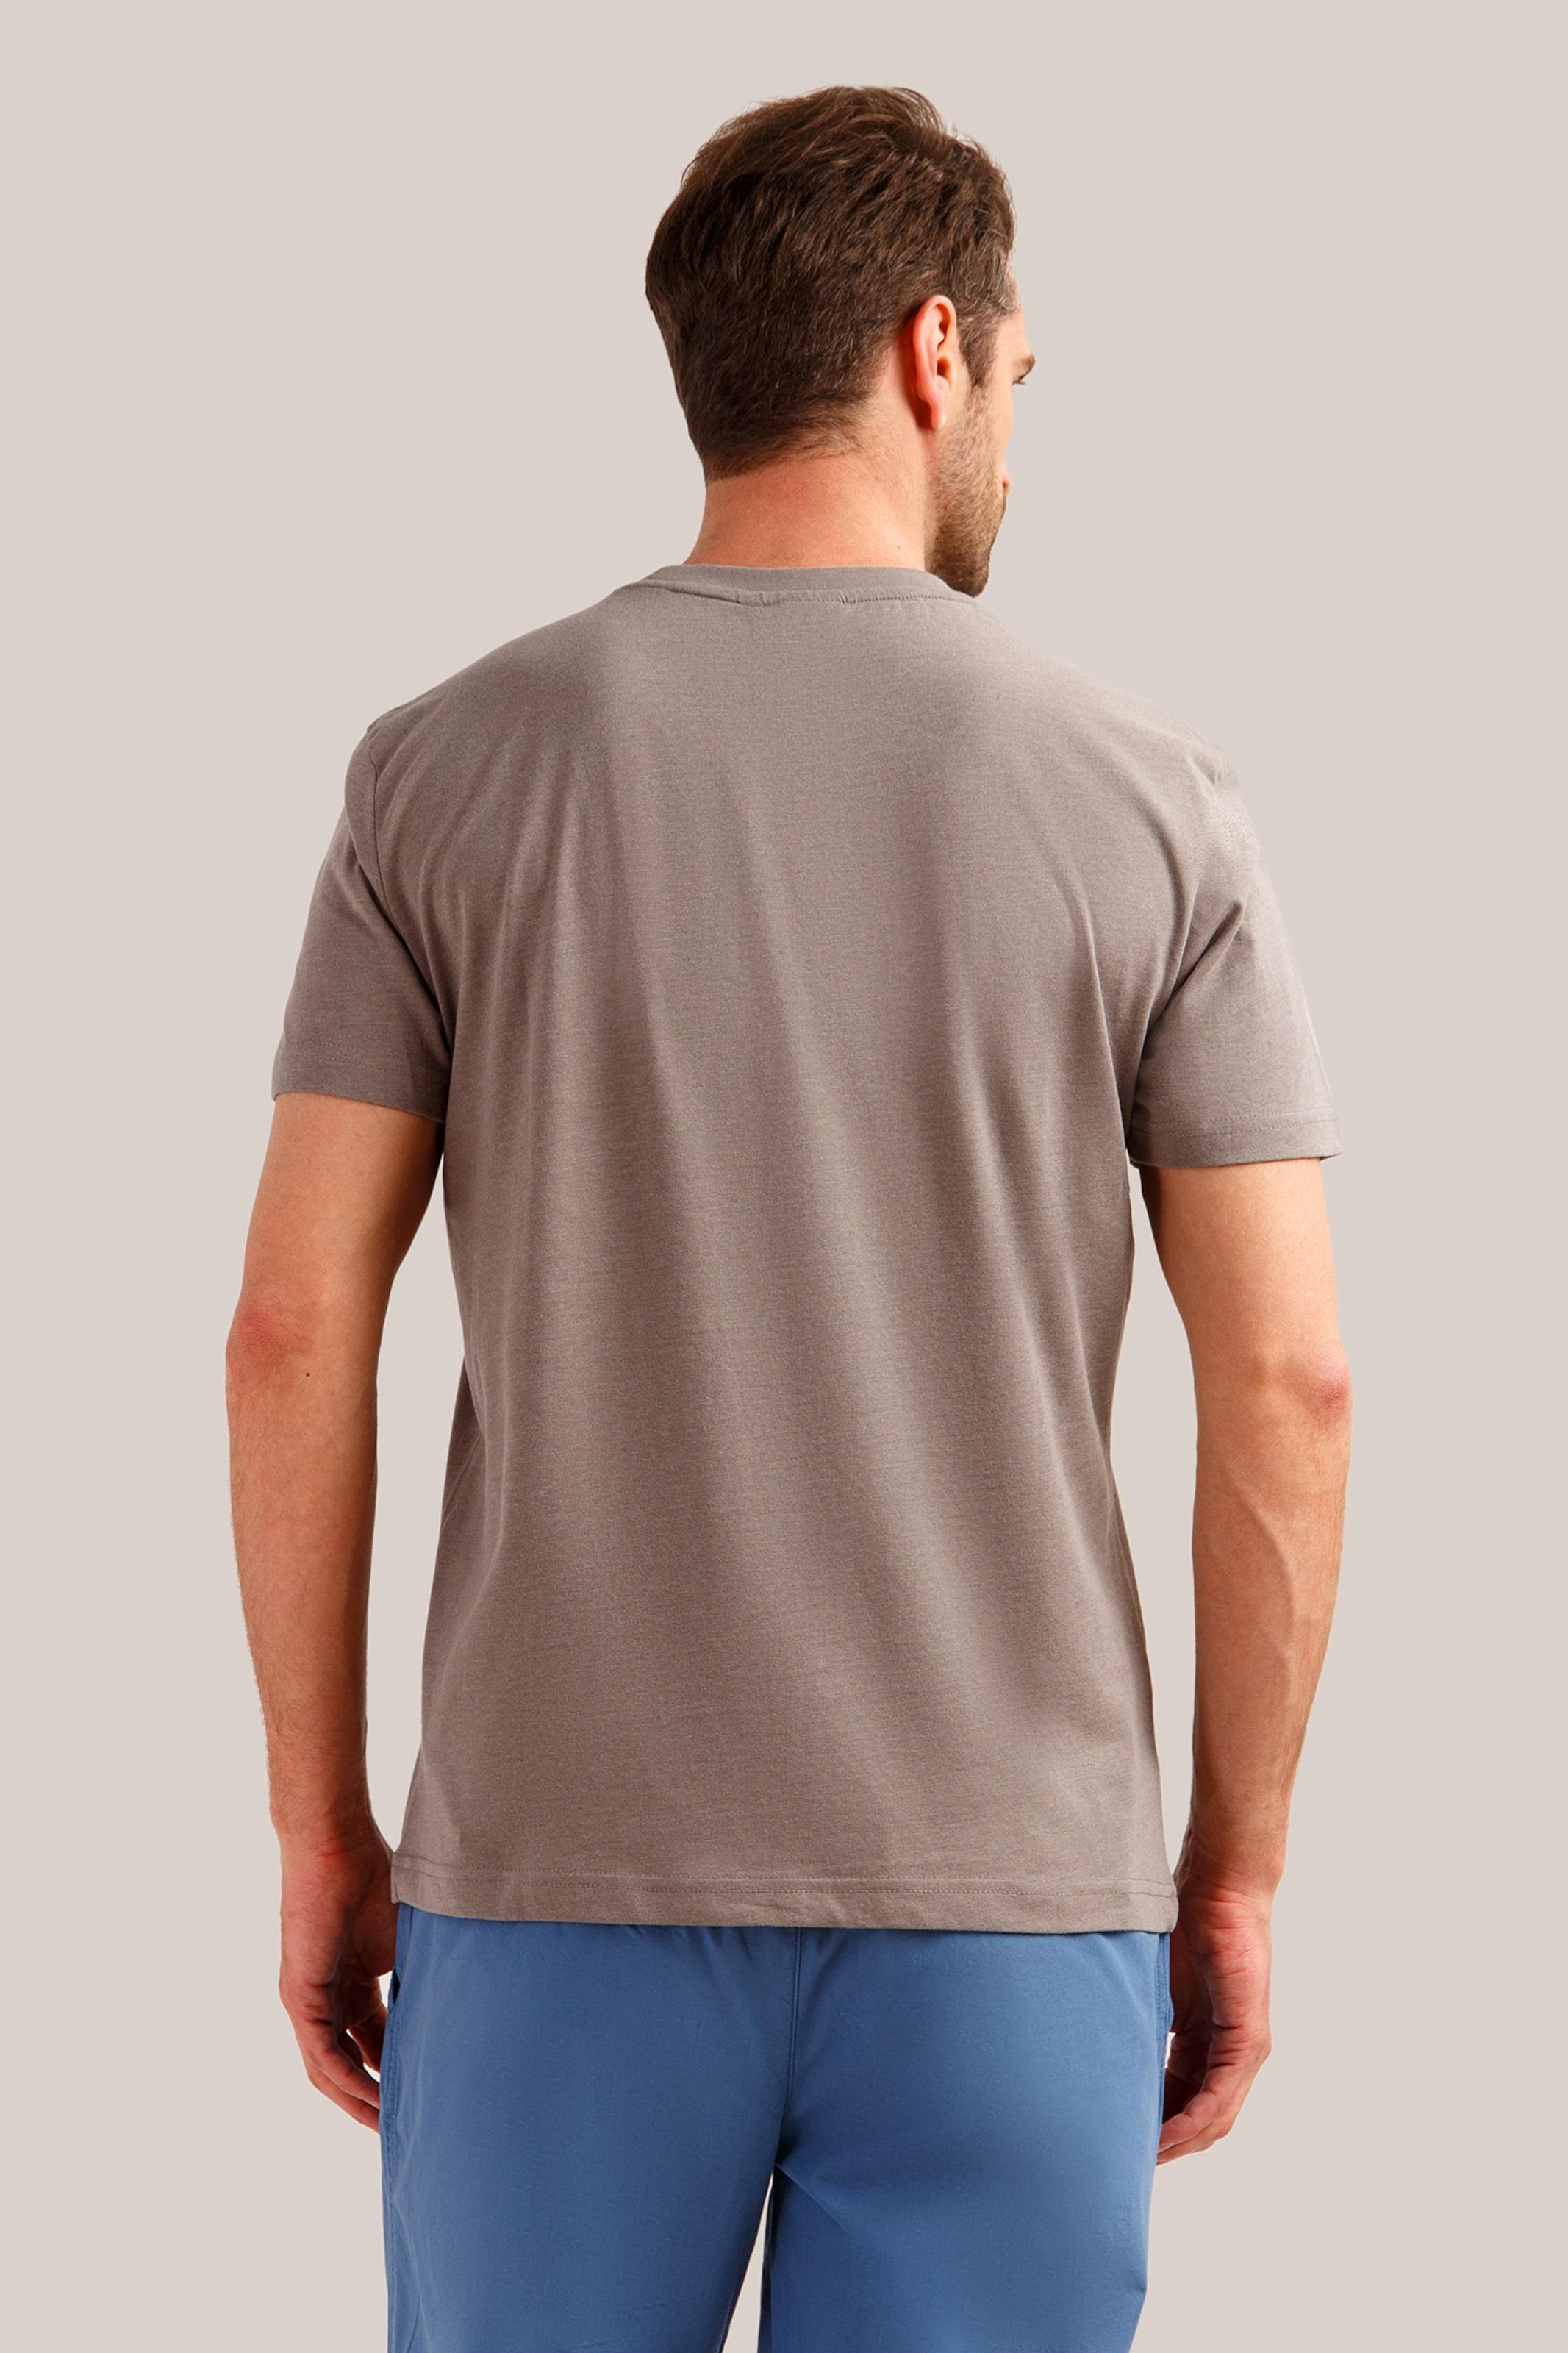 Basic shirt Braun Klassischem Design Finn Flare In vm80Nnw